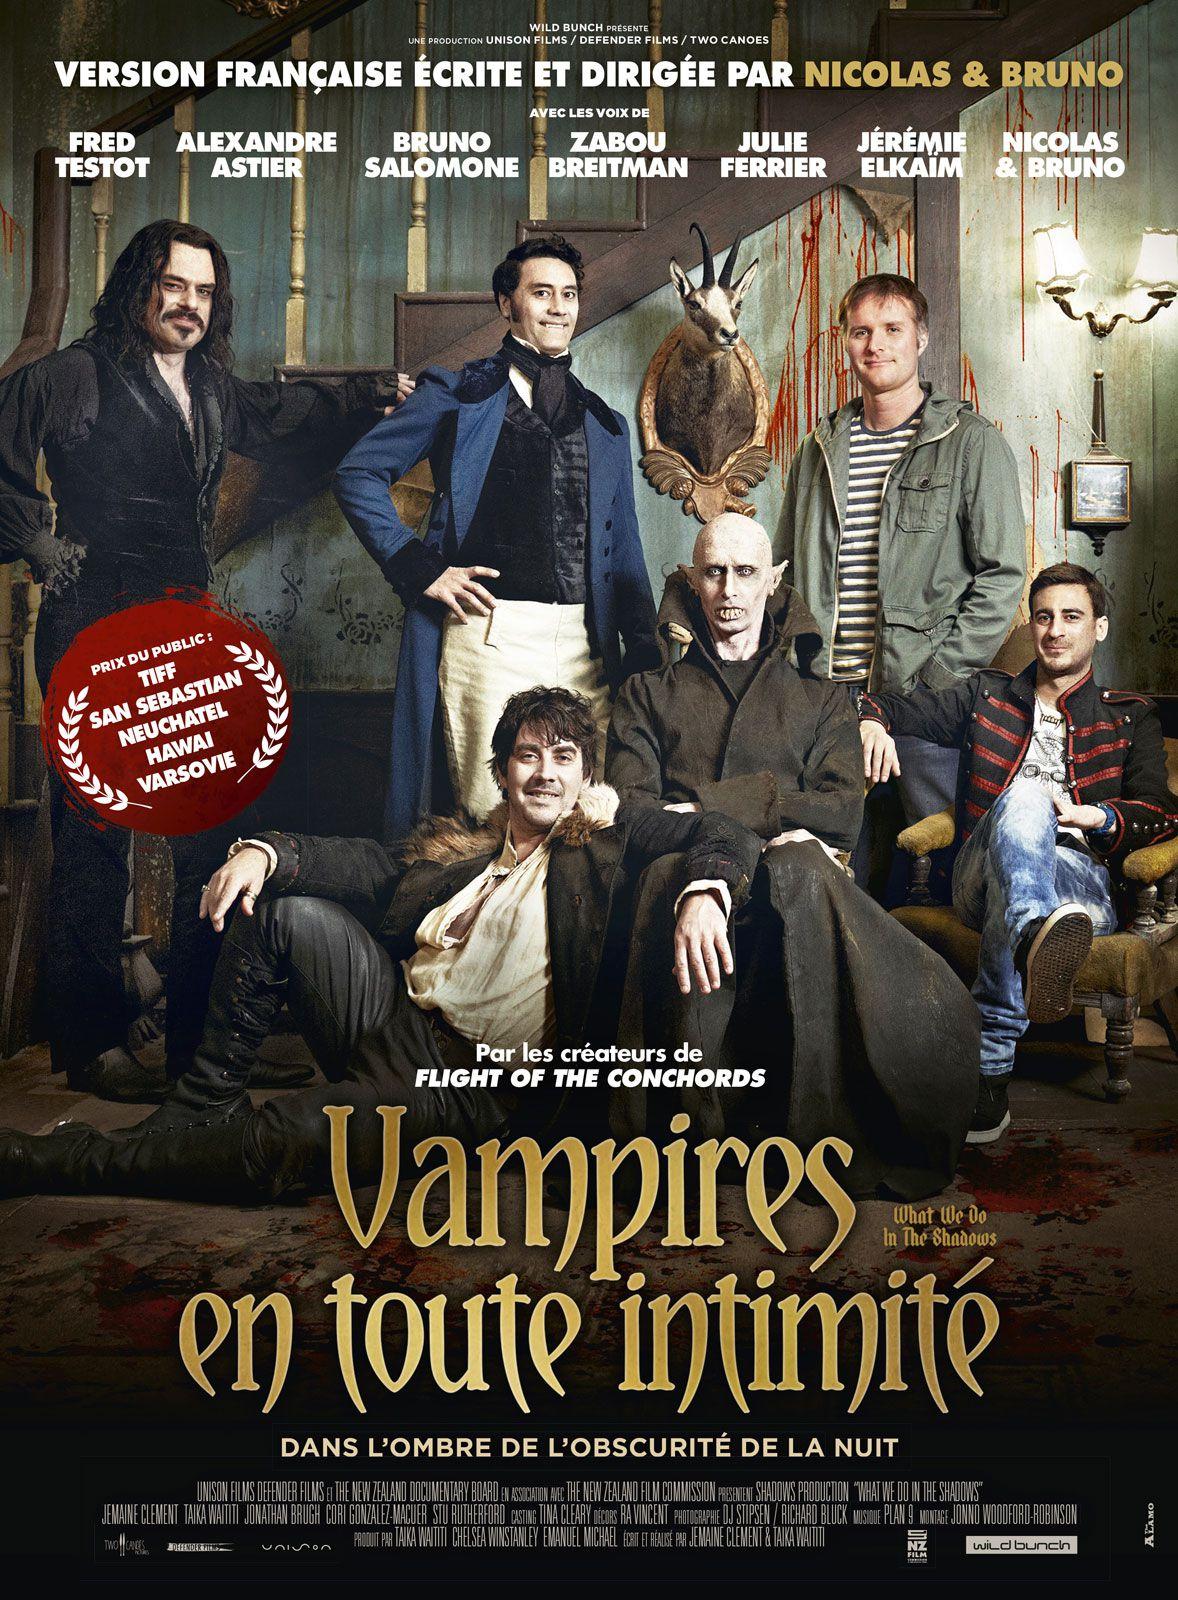 Vampires en toute intimité - Film (2014)